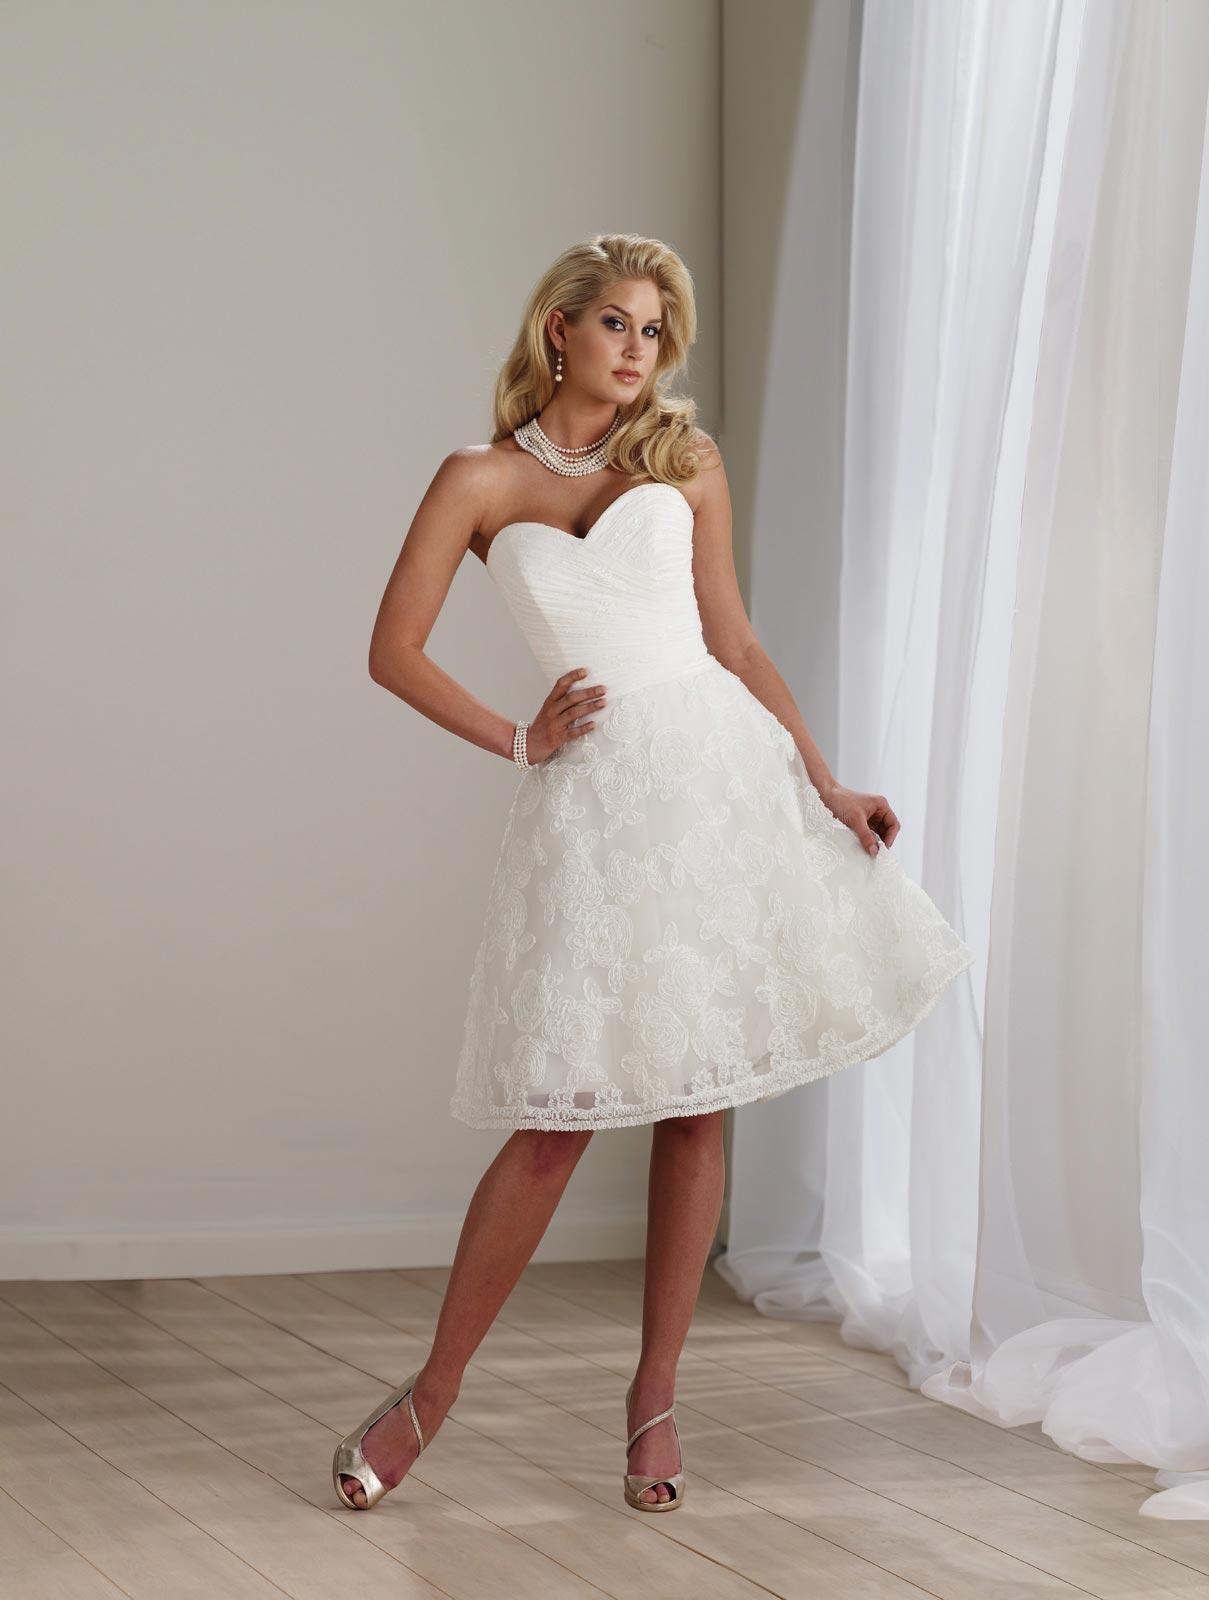 Short wedding dresses u bridal style beach wedding pinterest